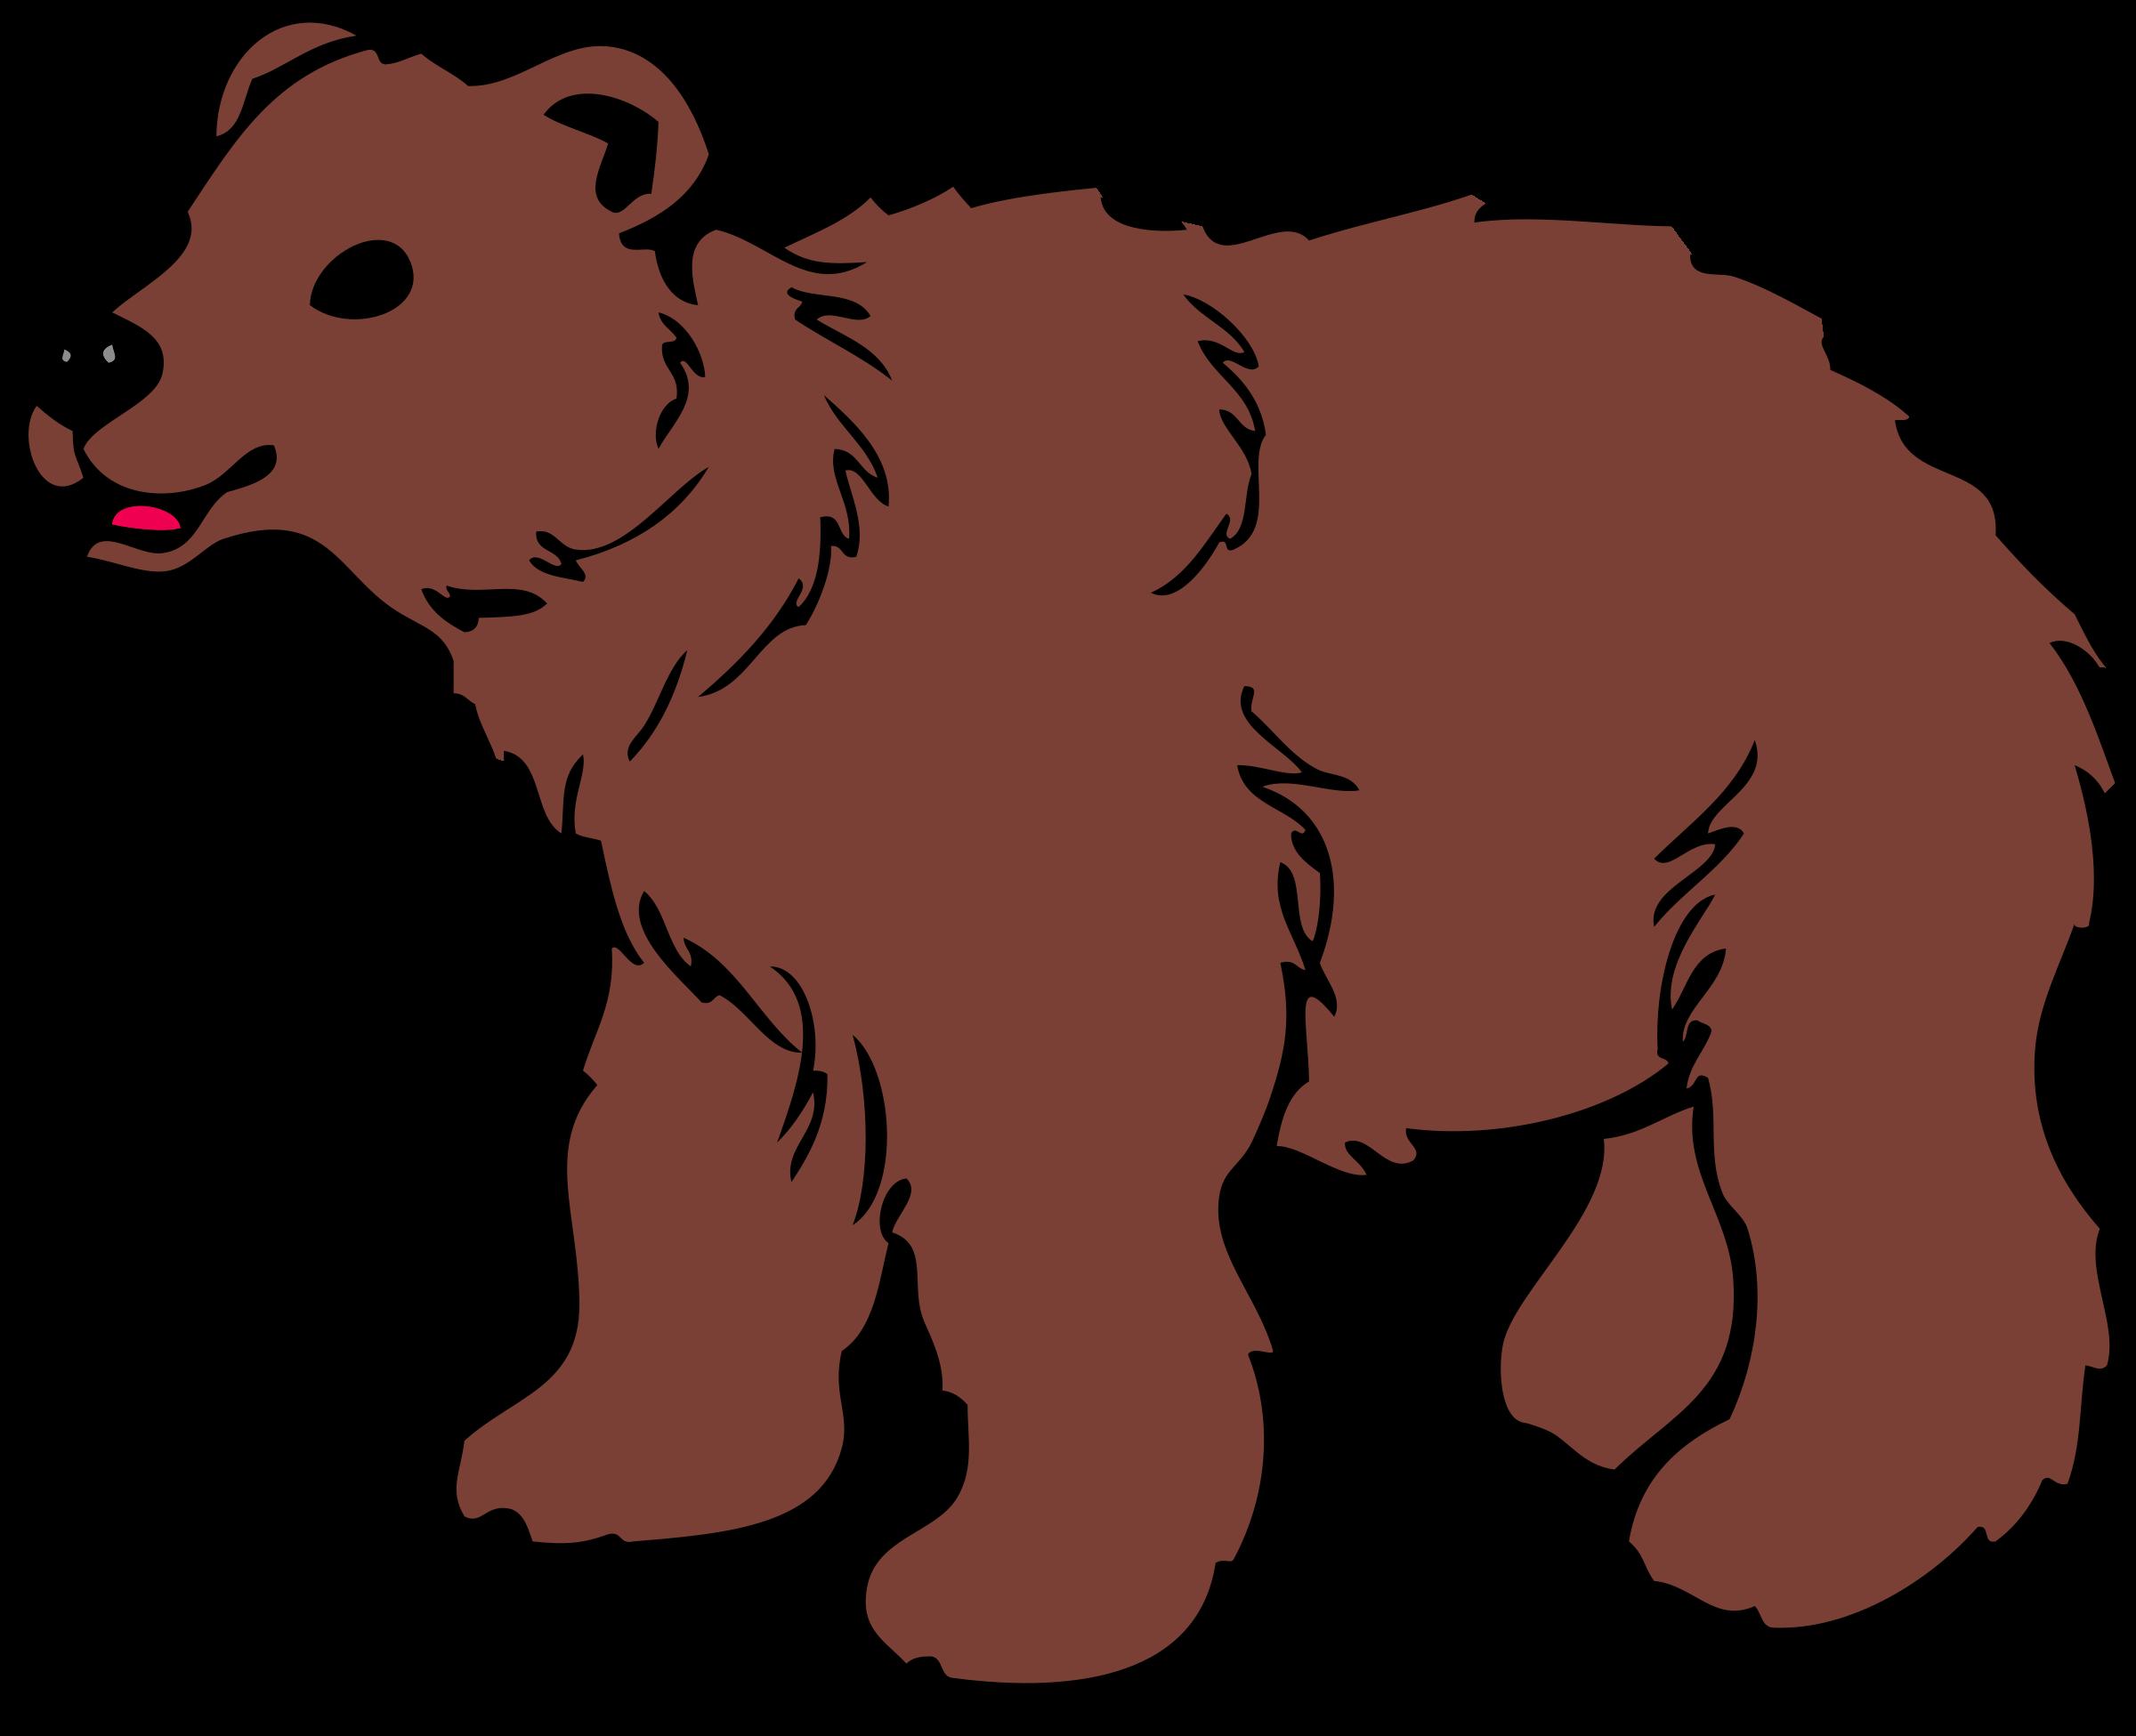 Bear art clipart image transparent Cartoon Bear Cub Clipart | Free download best Cartoon Bear Cub ... image transparent